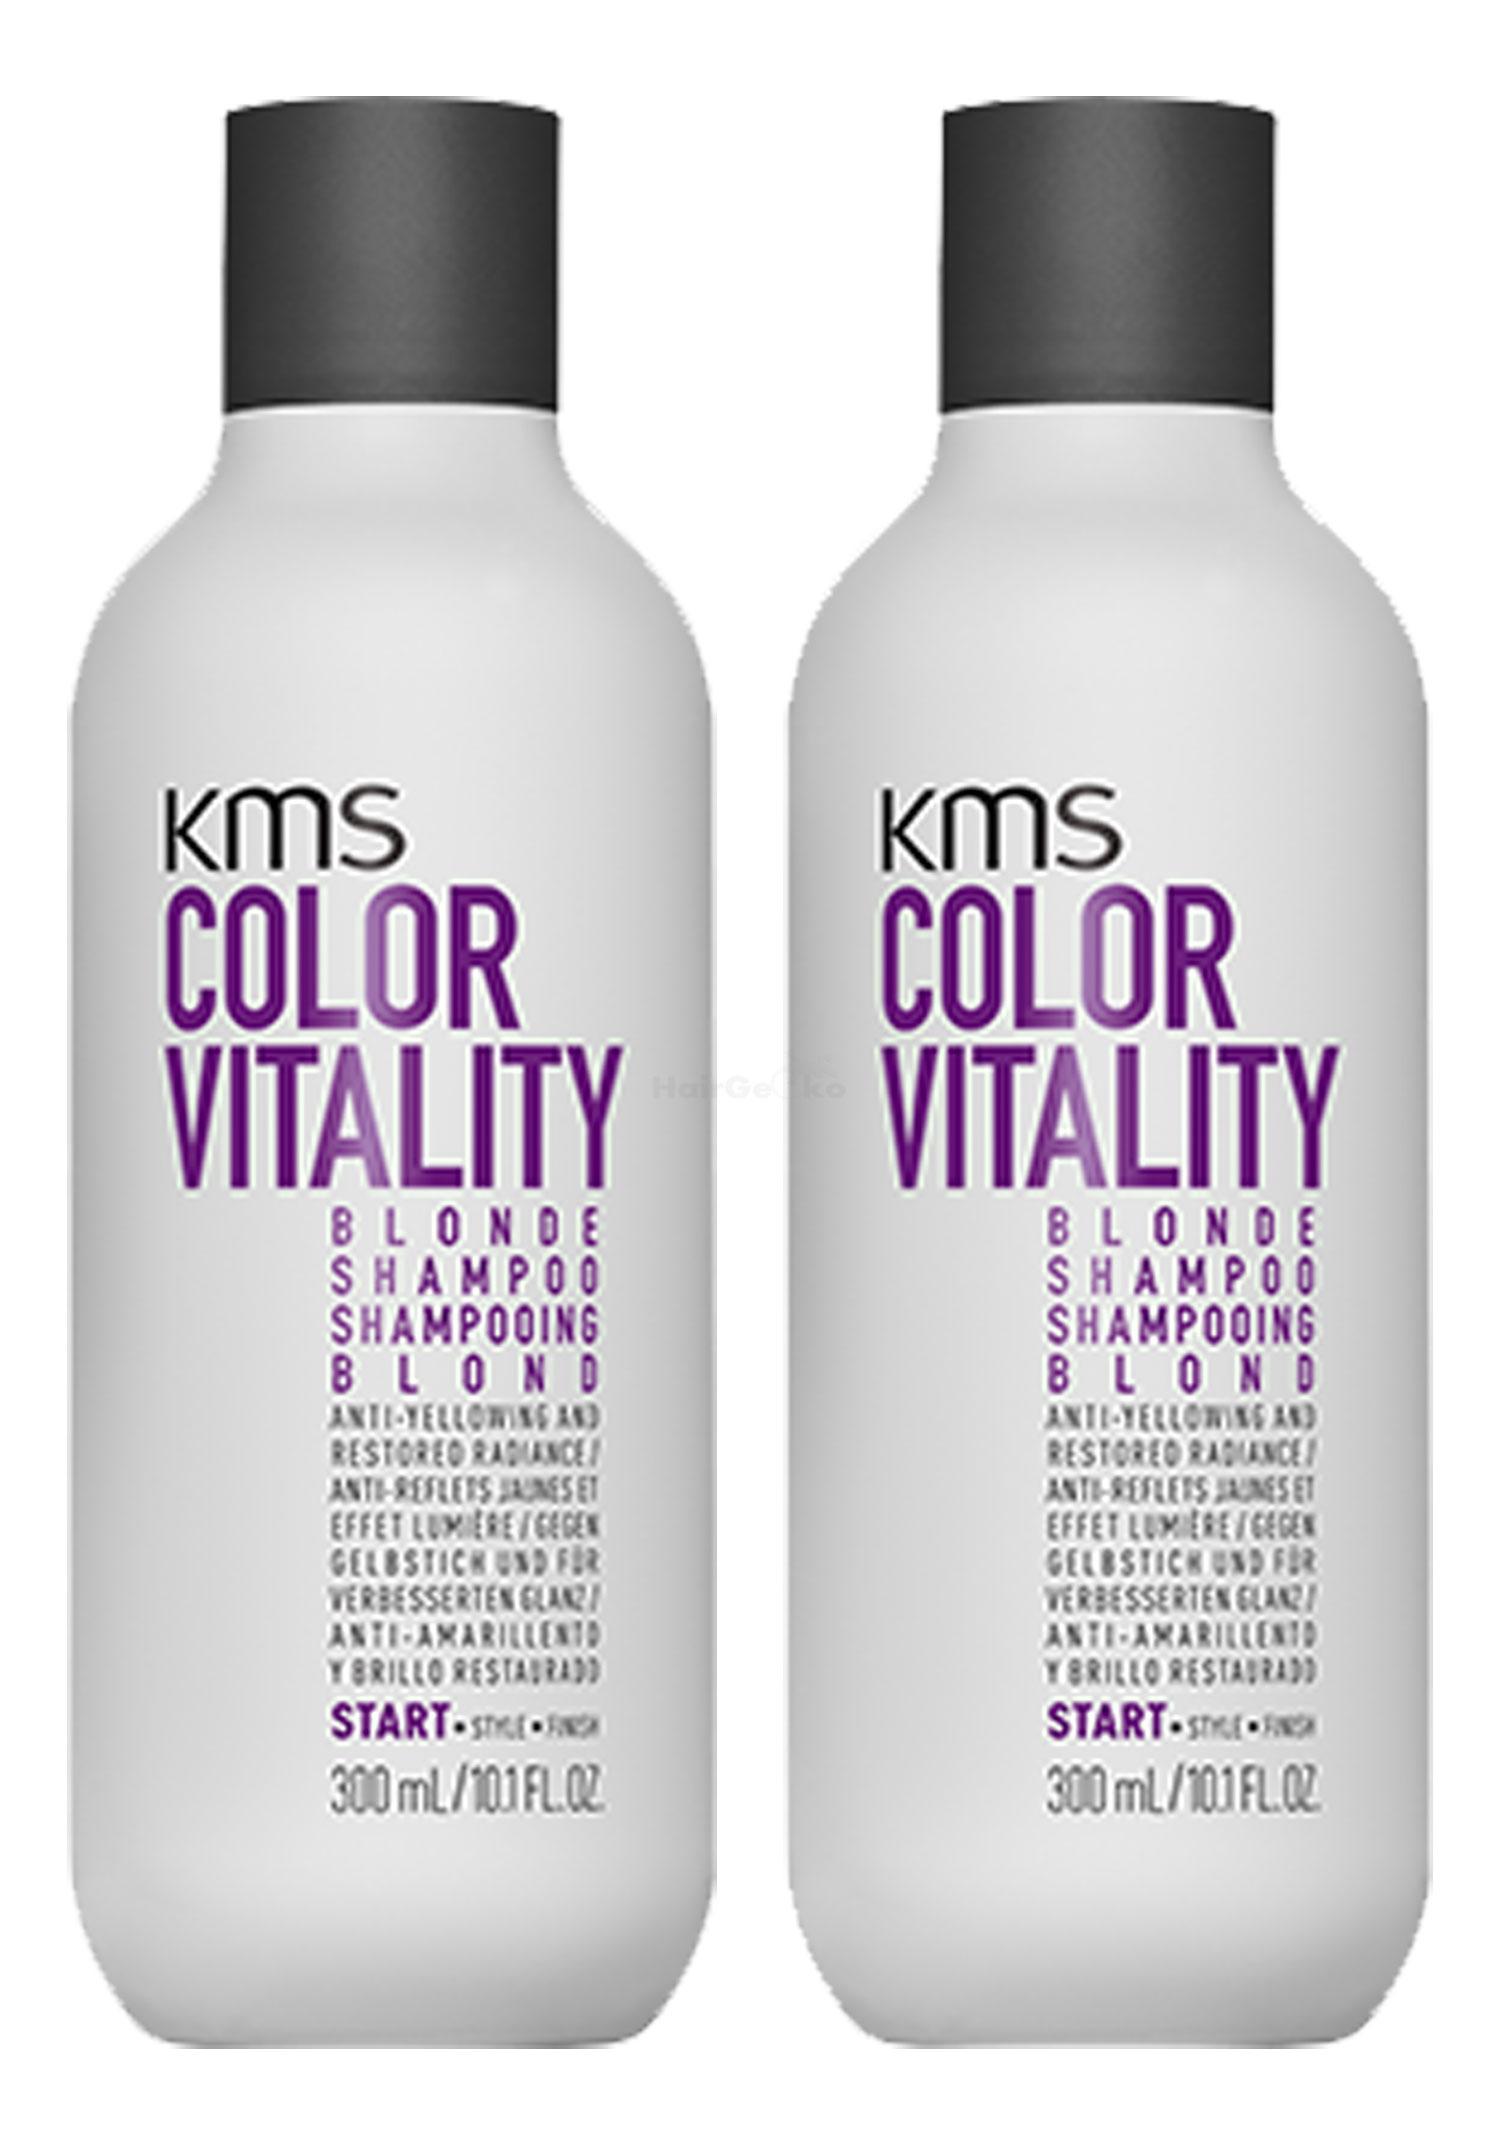 KMS California COLORVITALITY Blonde Shampoo 300ml x2 = 600ml - NEU